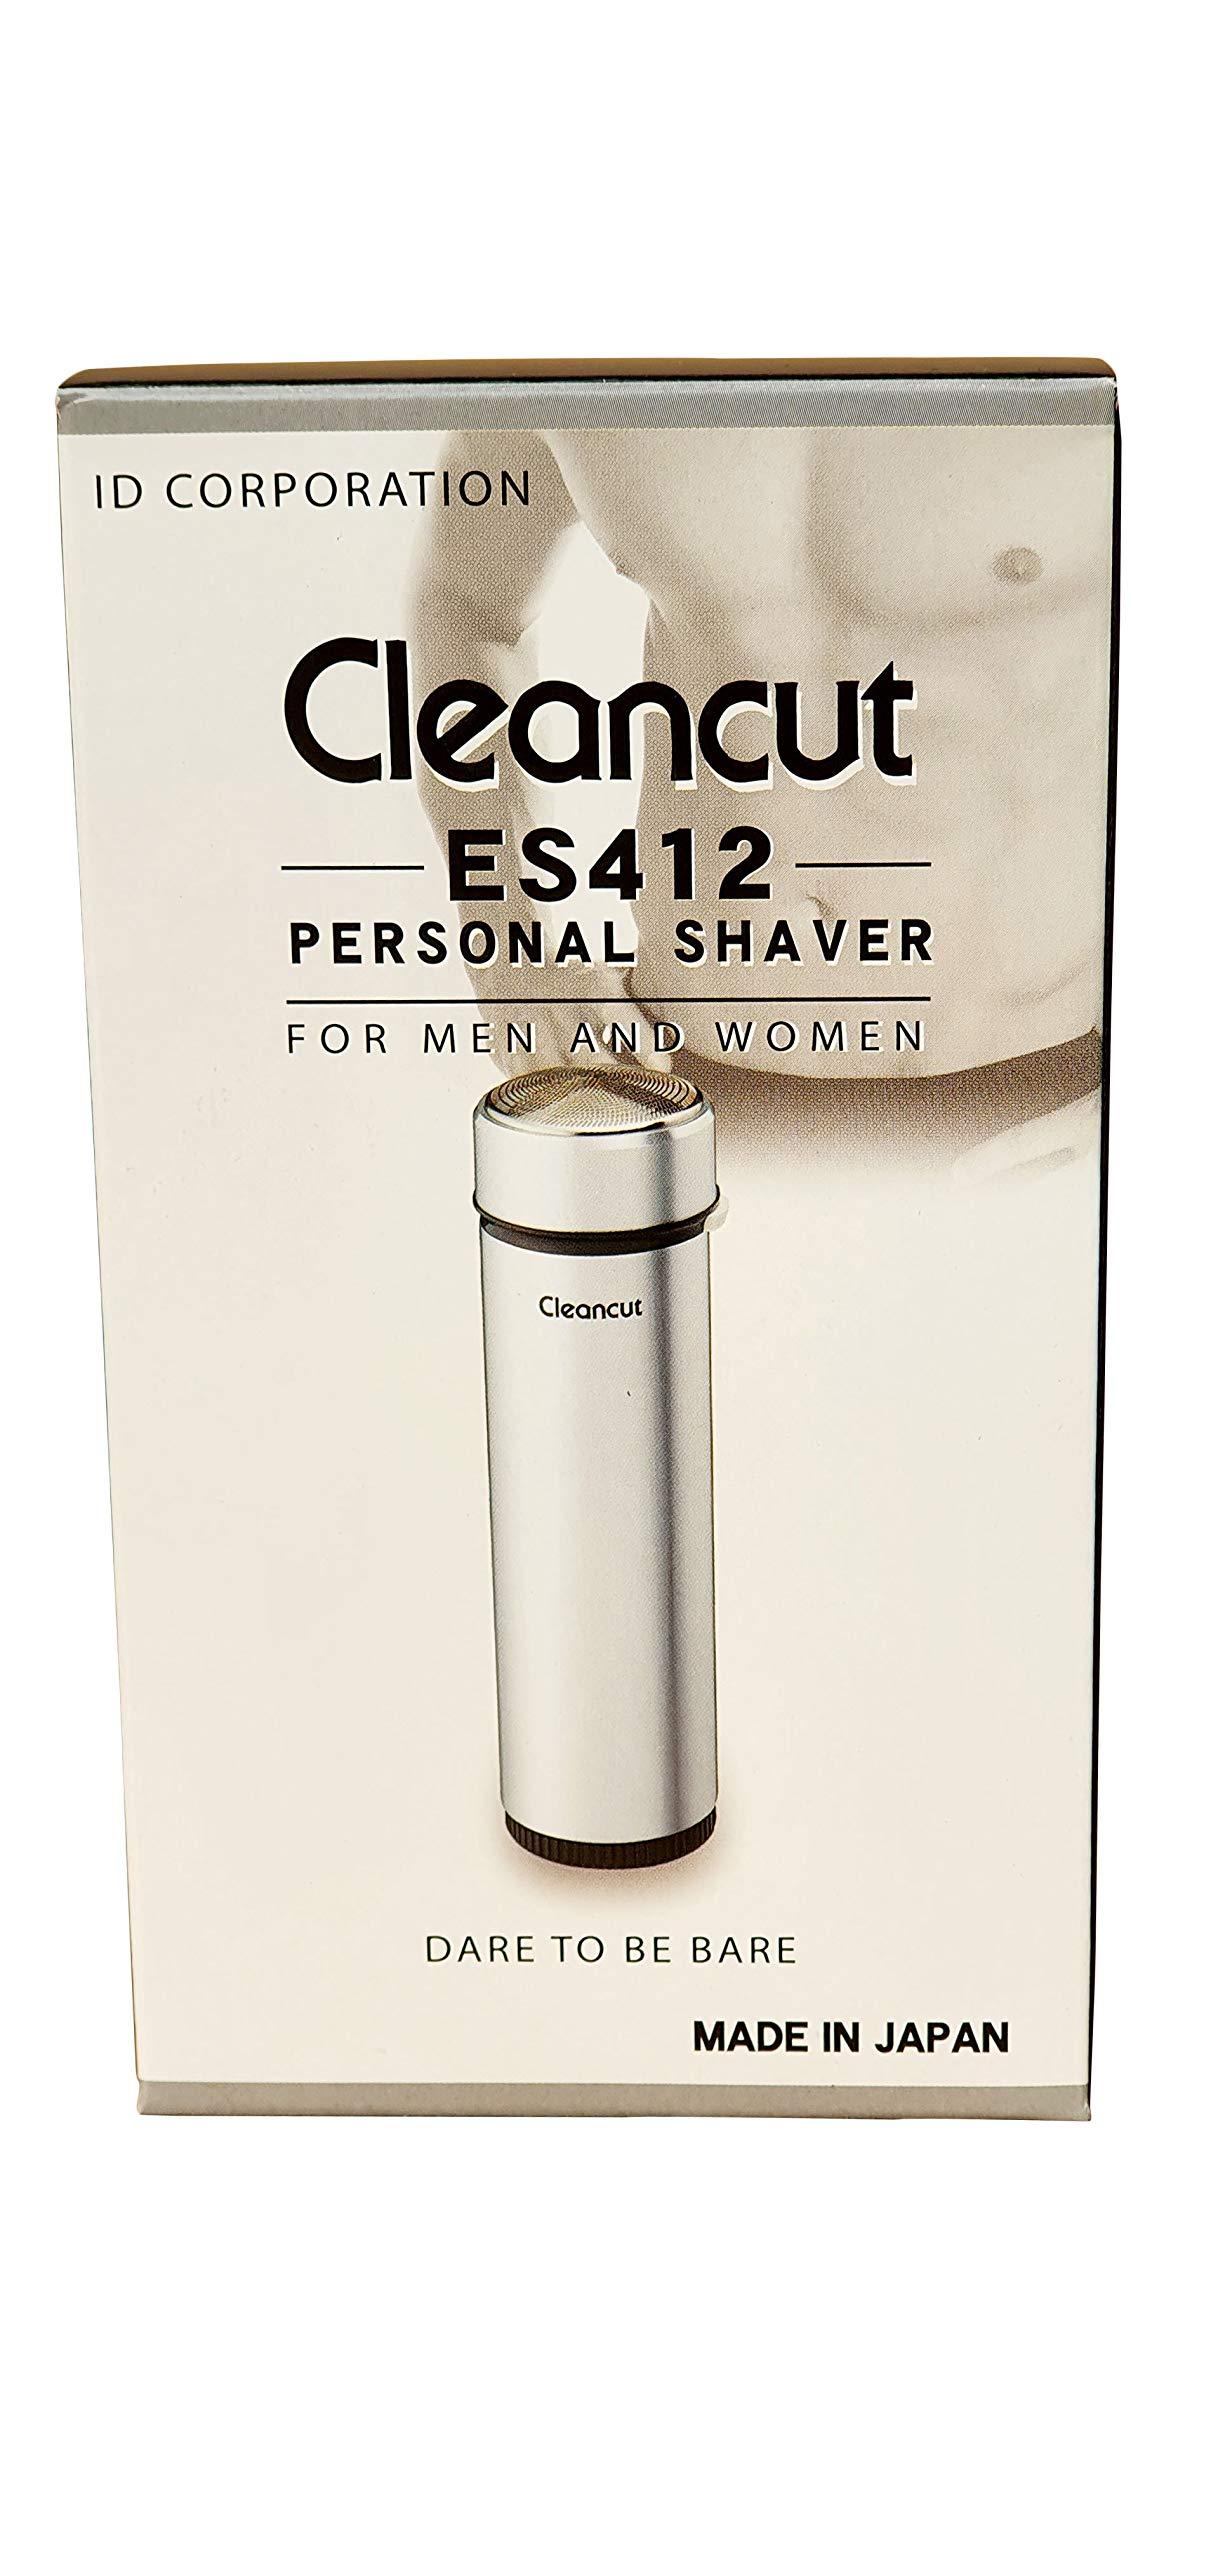 Japanese Cleancut ES412 Intimate Area Shaver for Women & Men